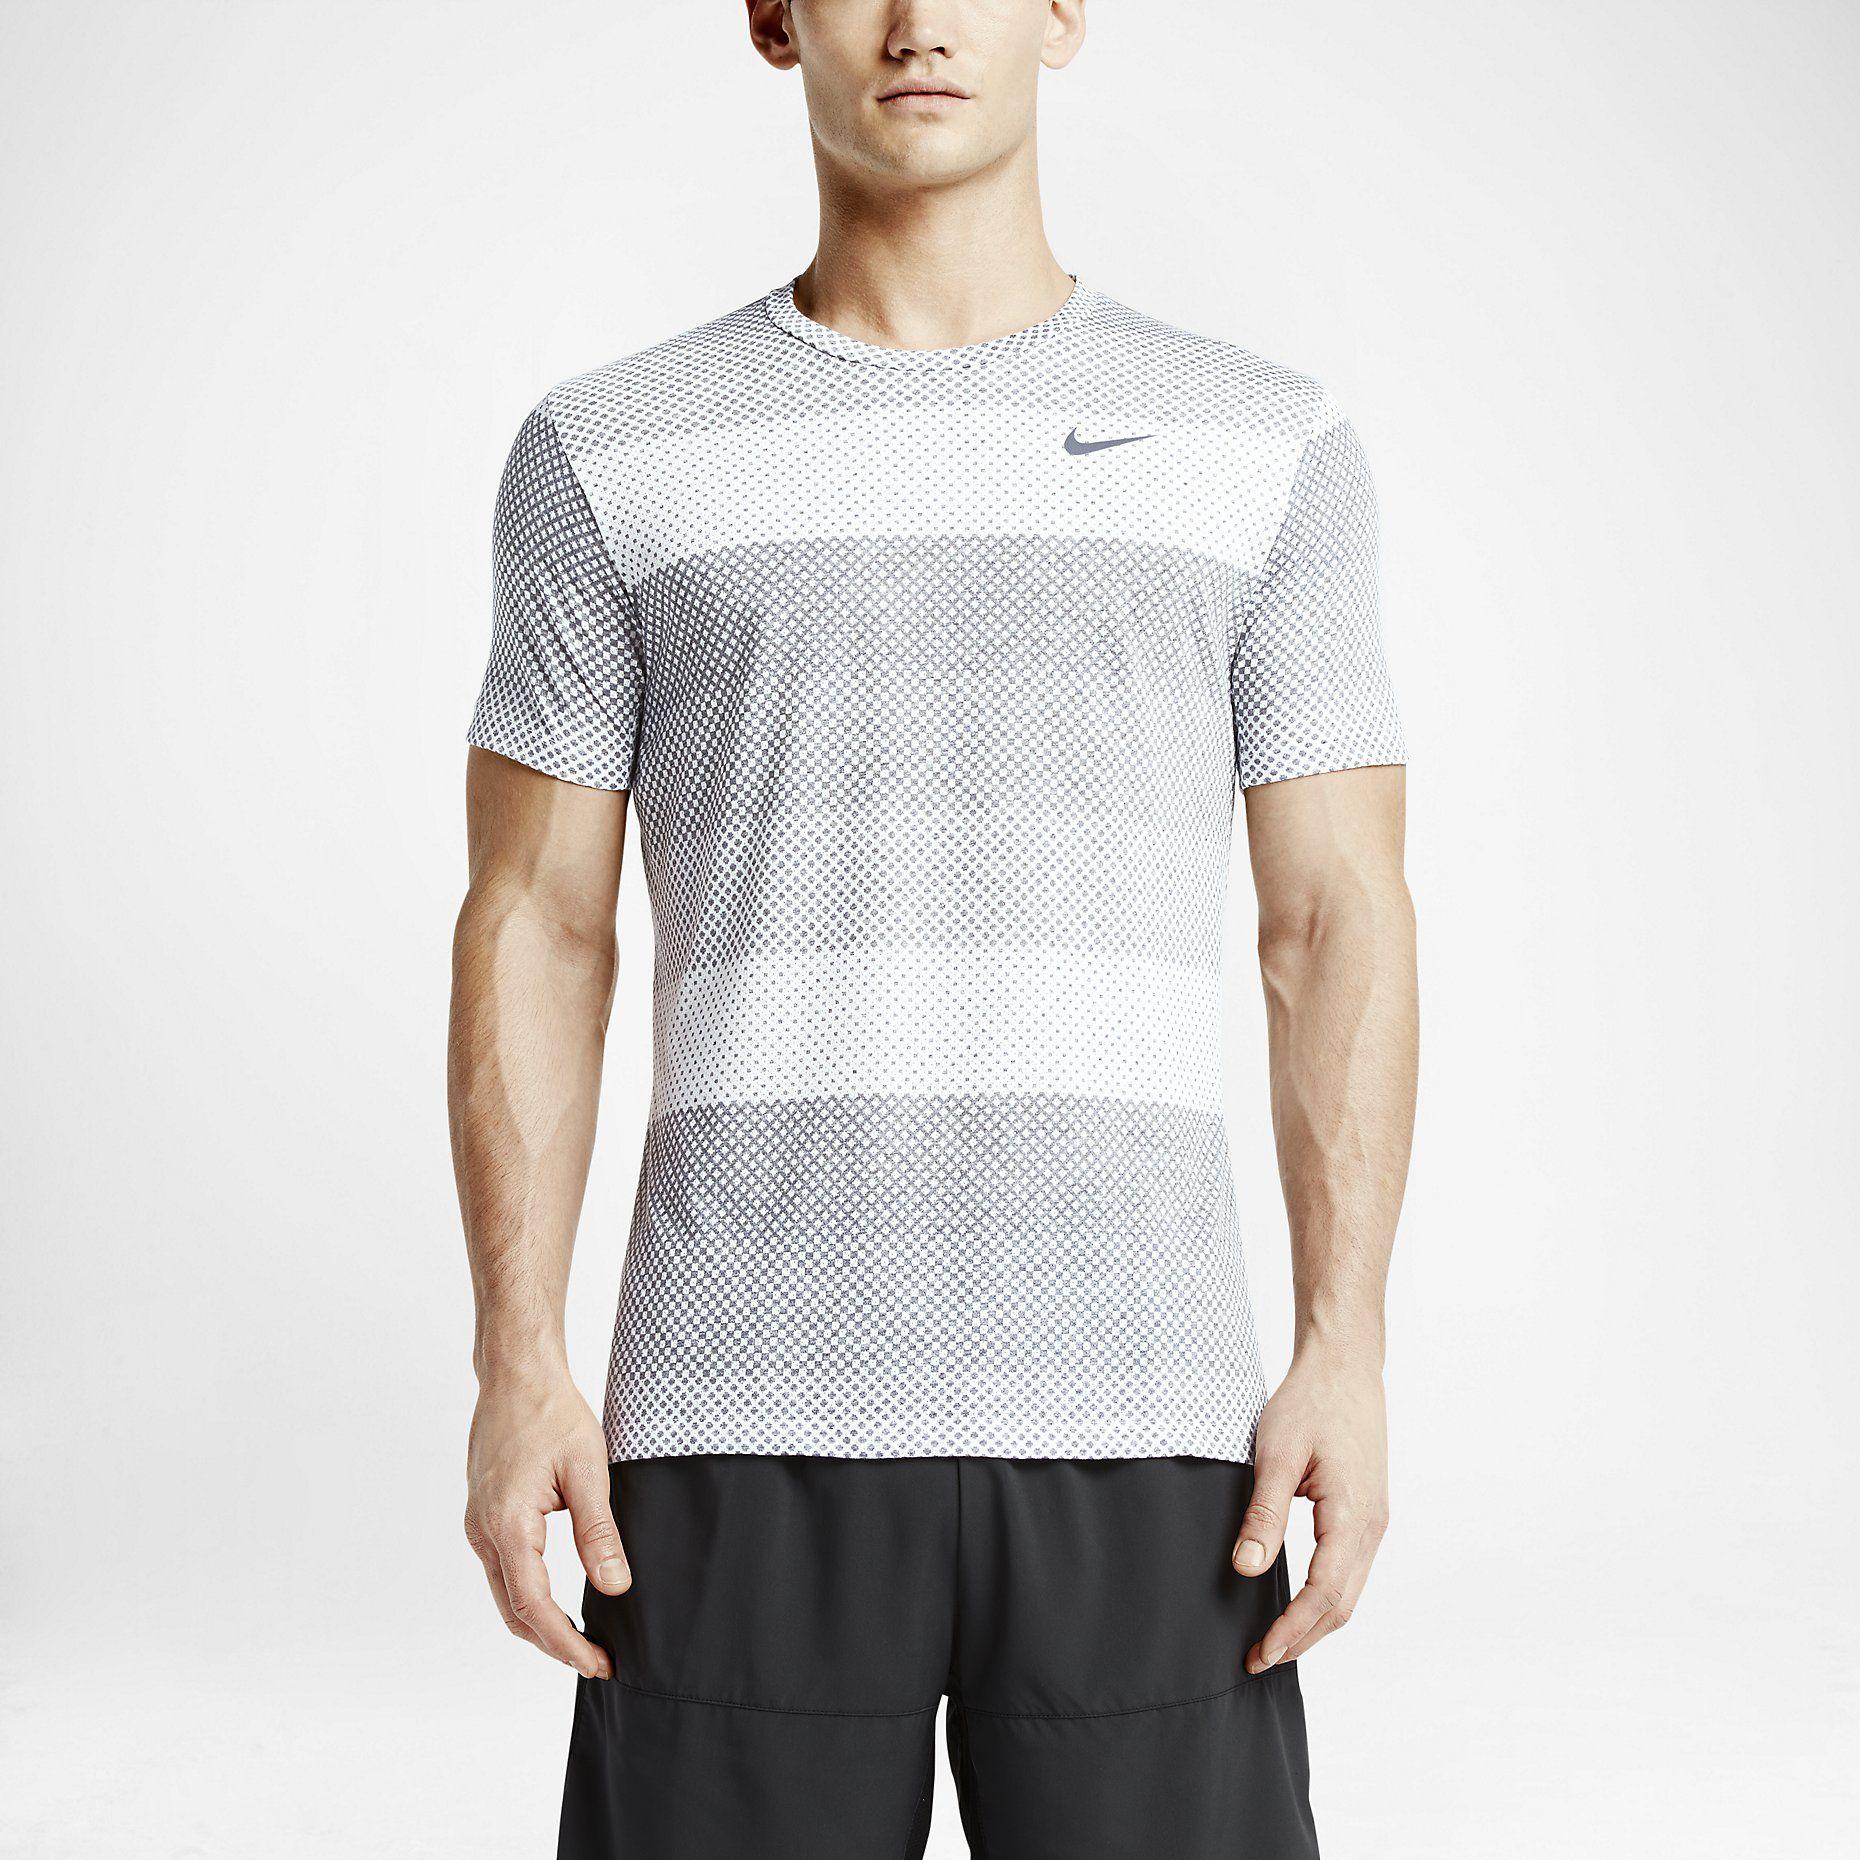 3f45ba5ab619b Nike Dri-FIT Cool Stripe Tailwind Crew Men s Running Shirt. Nike Store